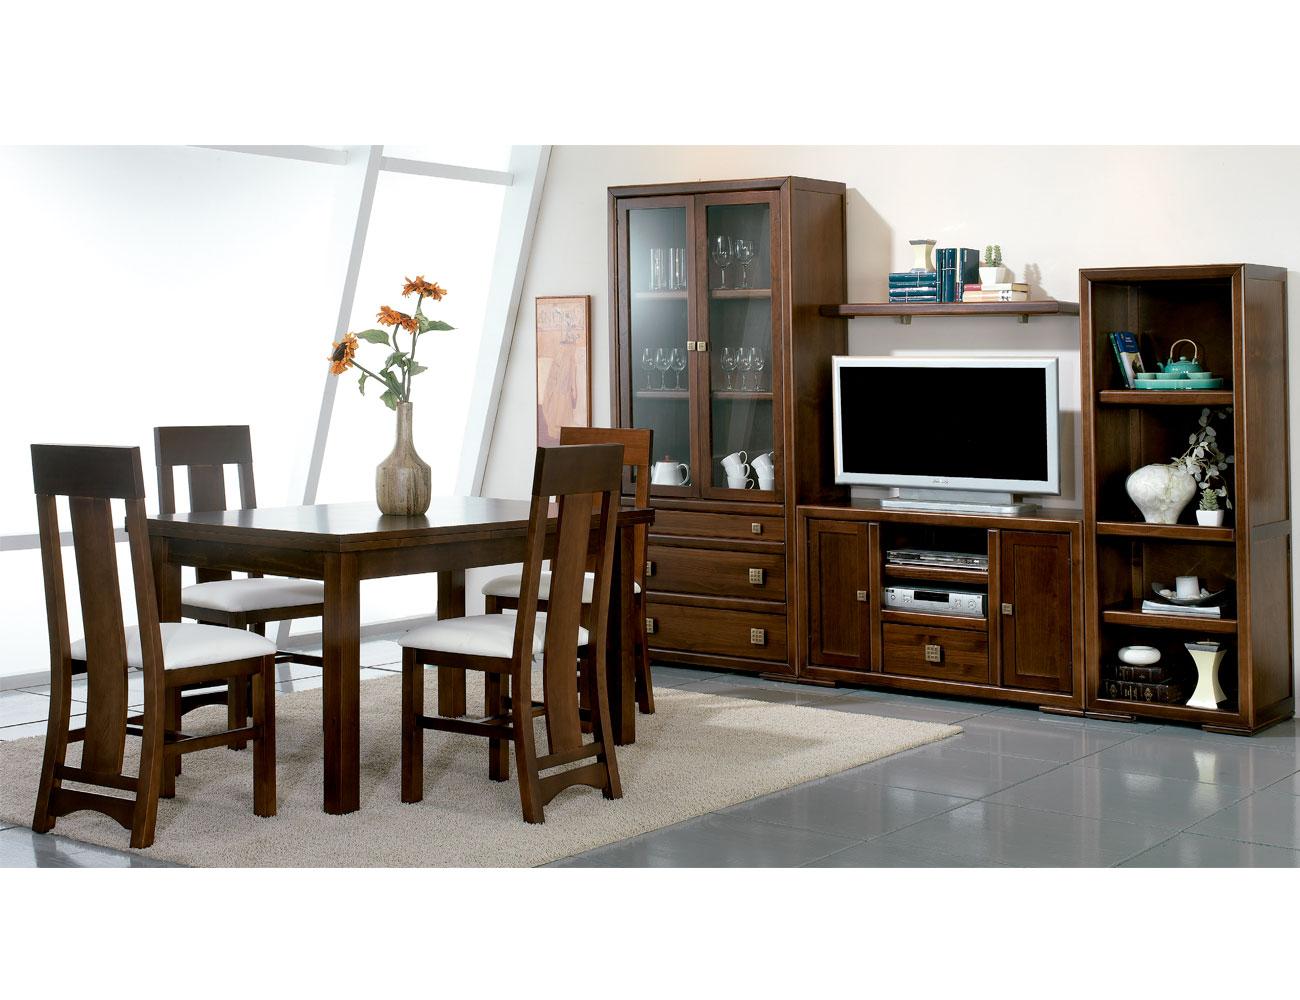 Composicion12 mueble salon comedor mesa silla5